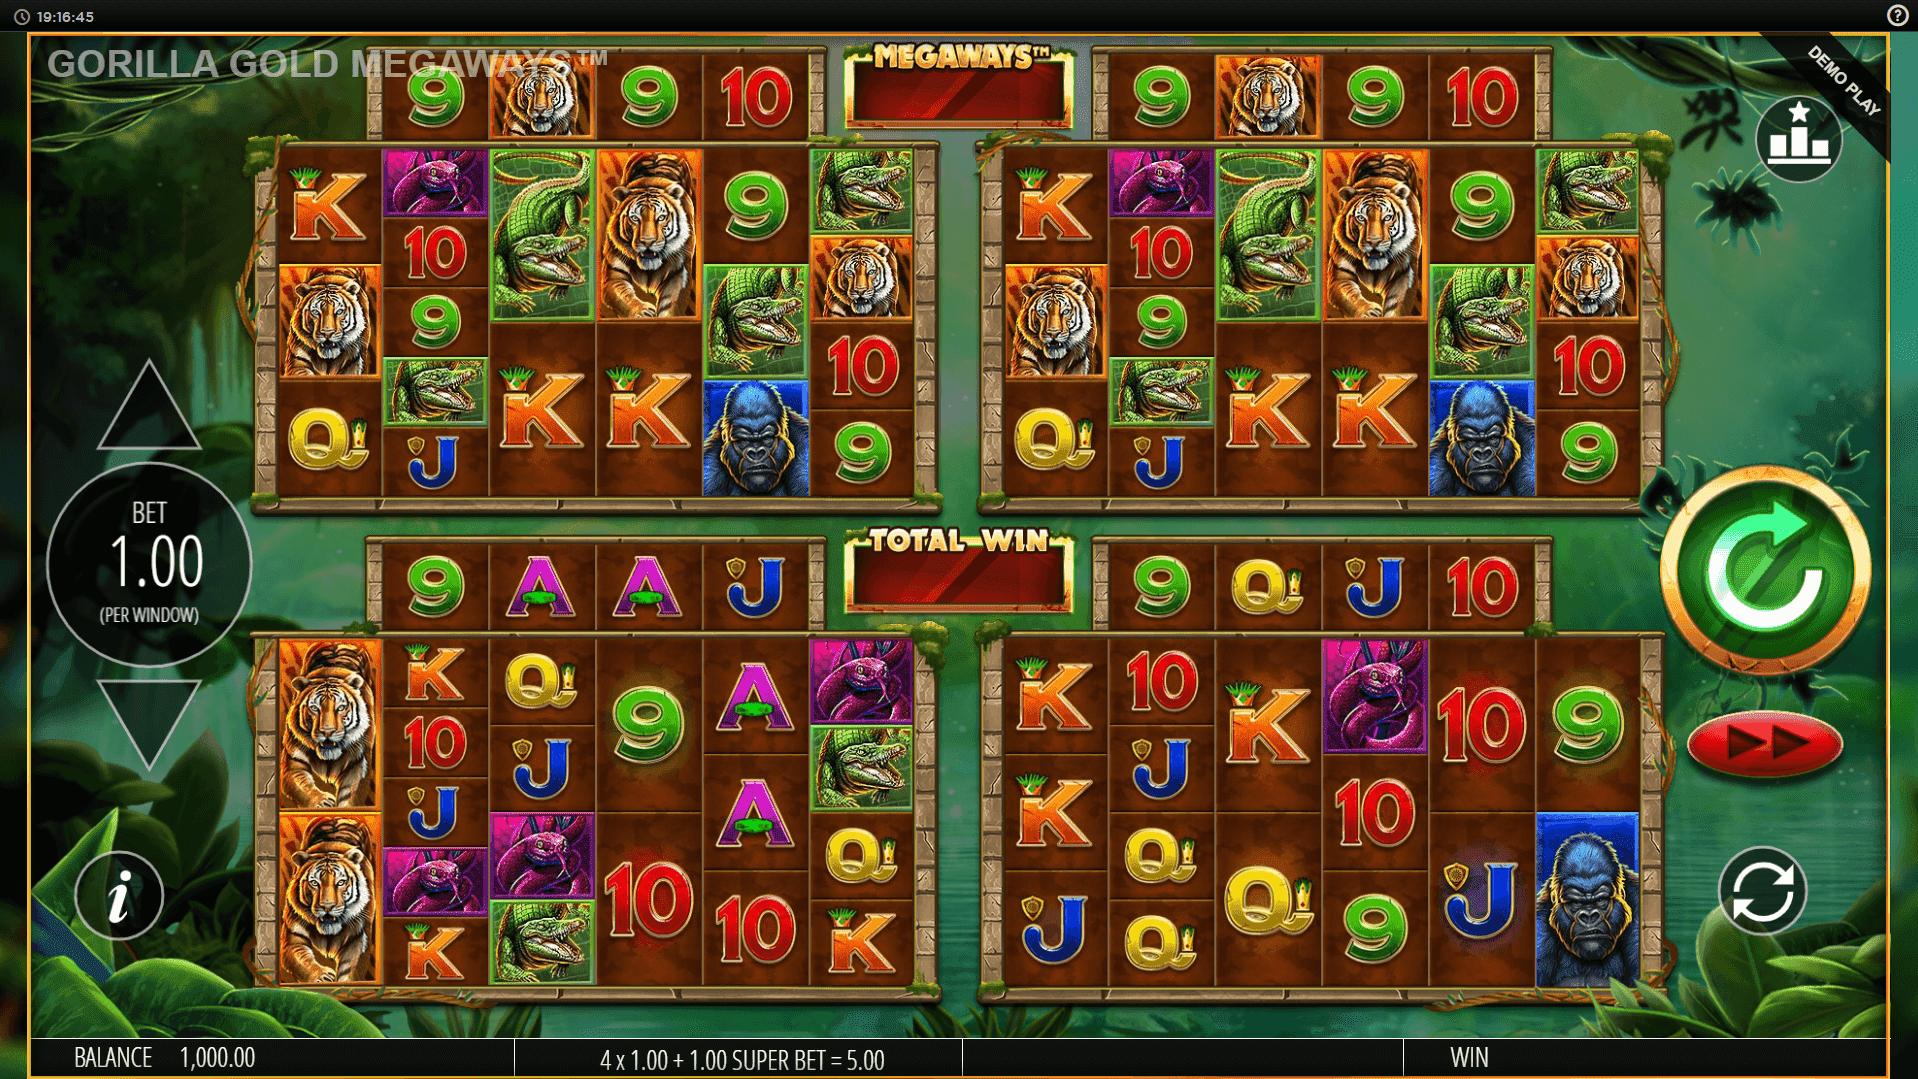 Gorilla Gold Megaways slot machine screenshot